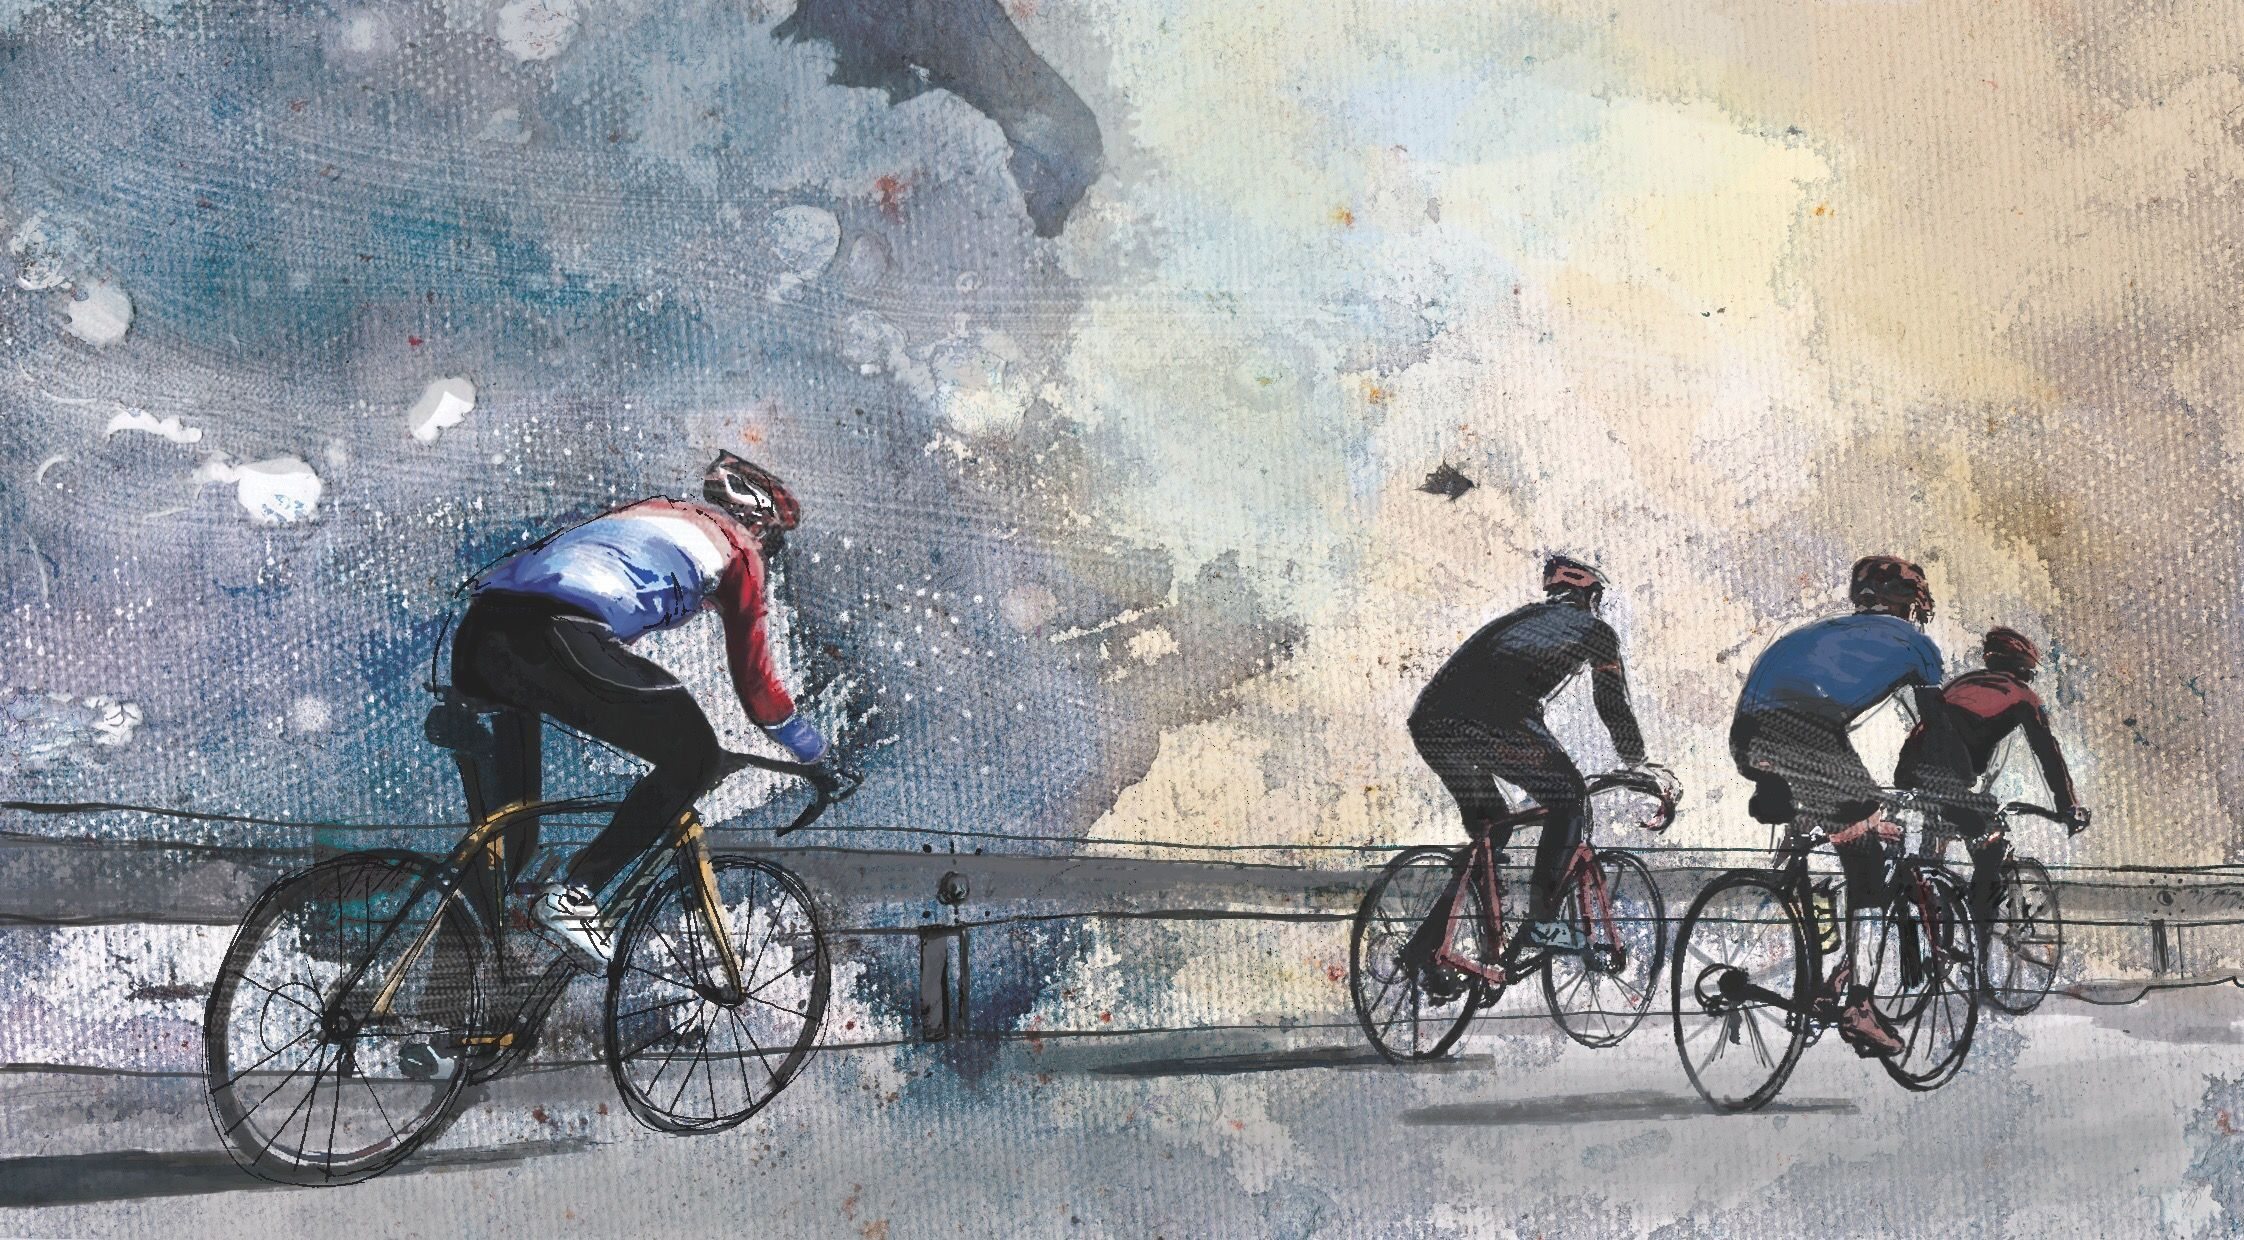 65 Road Cycling Wallpapers Download At Wallpaperbro